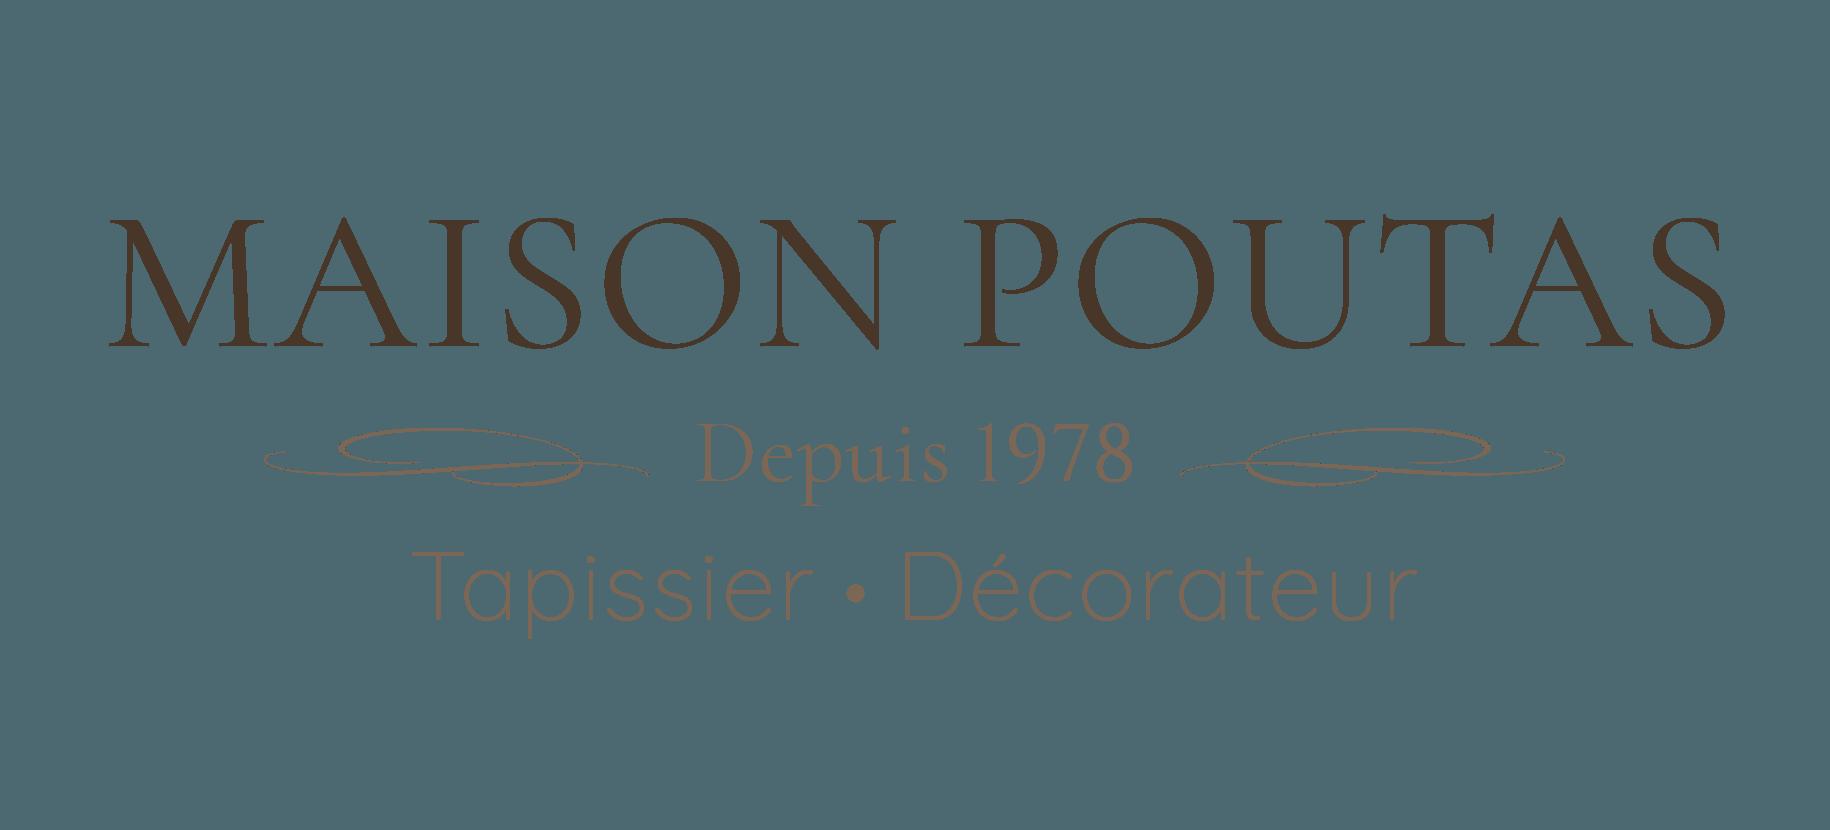 Maison Poutas